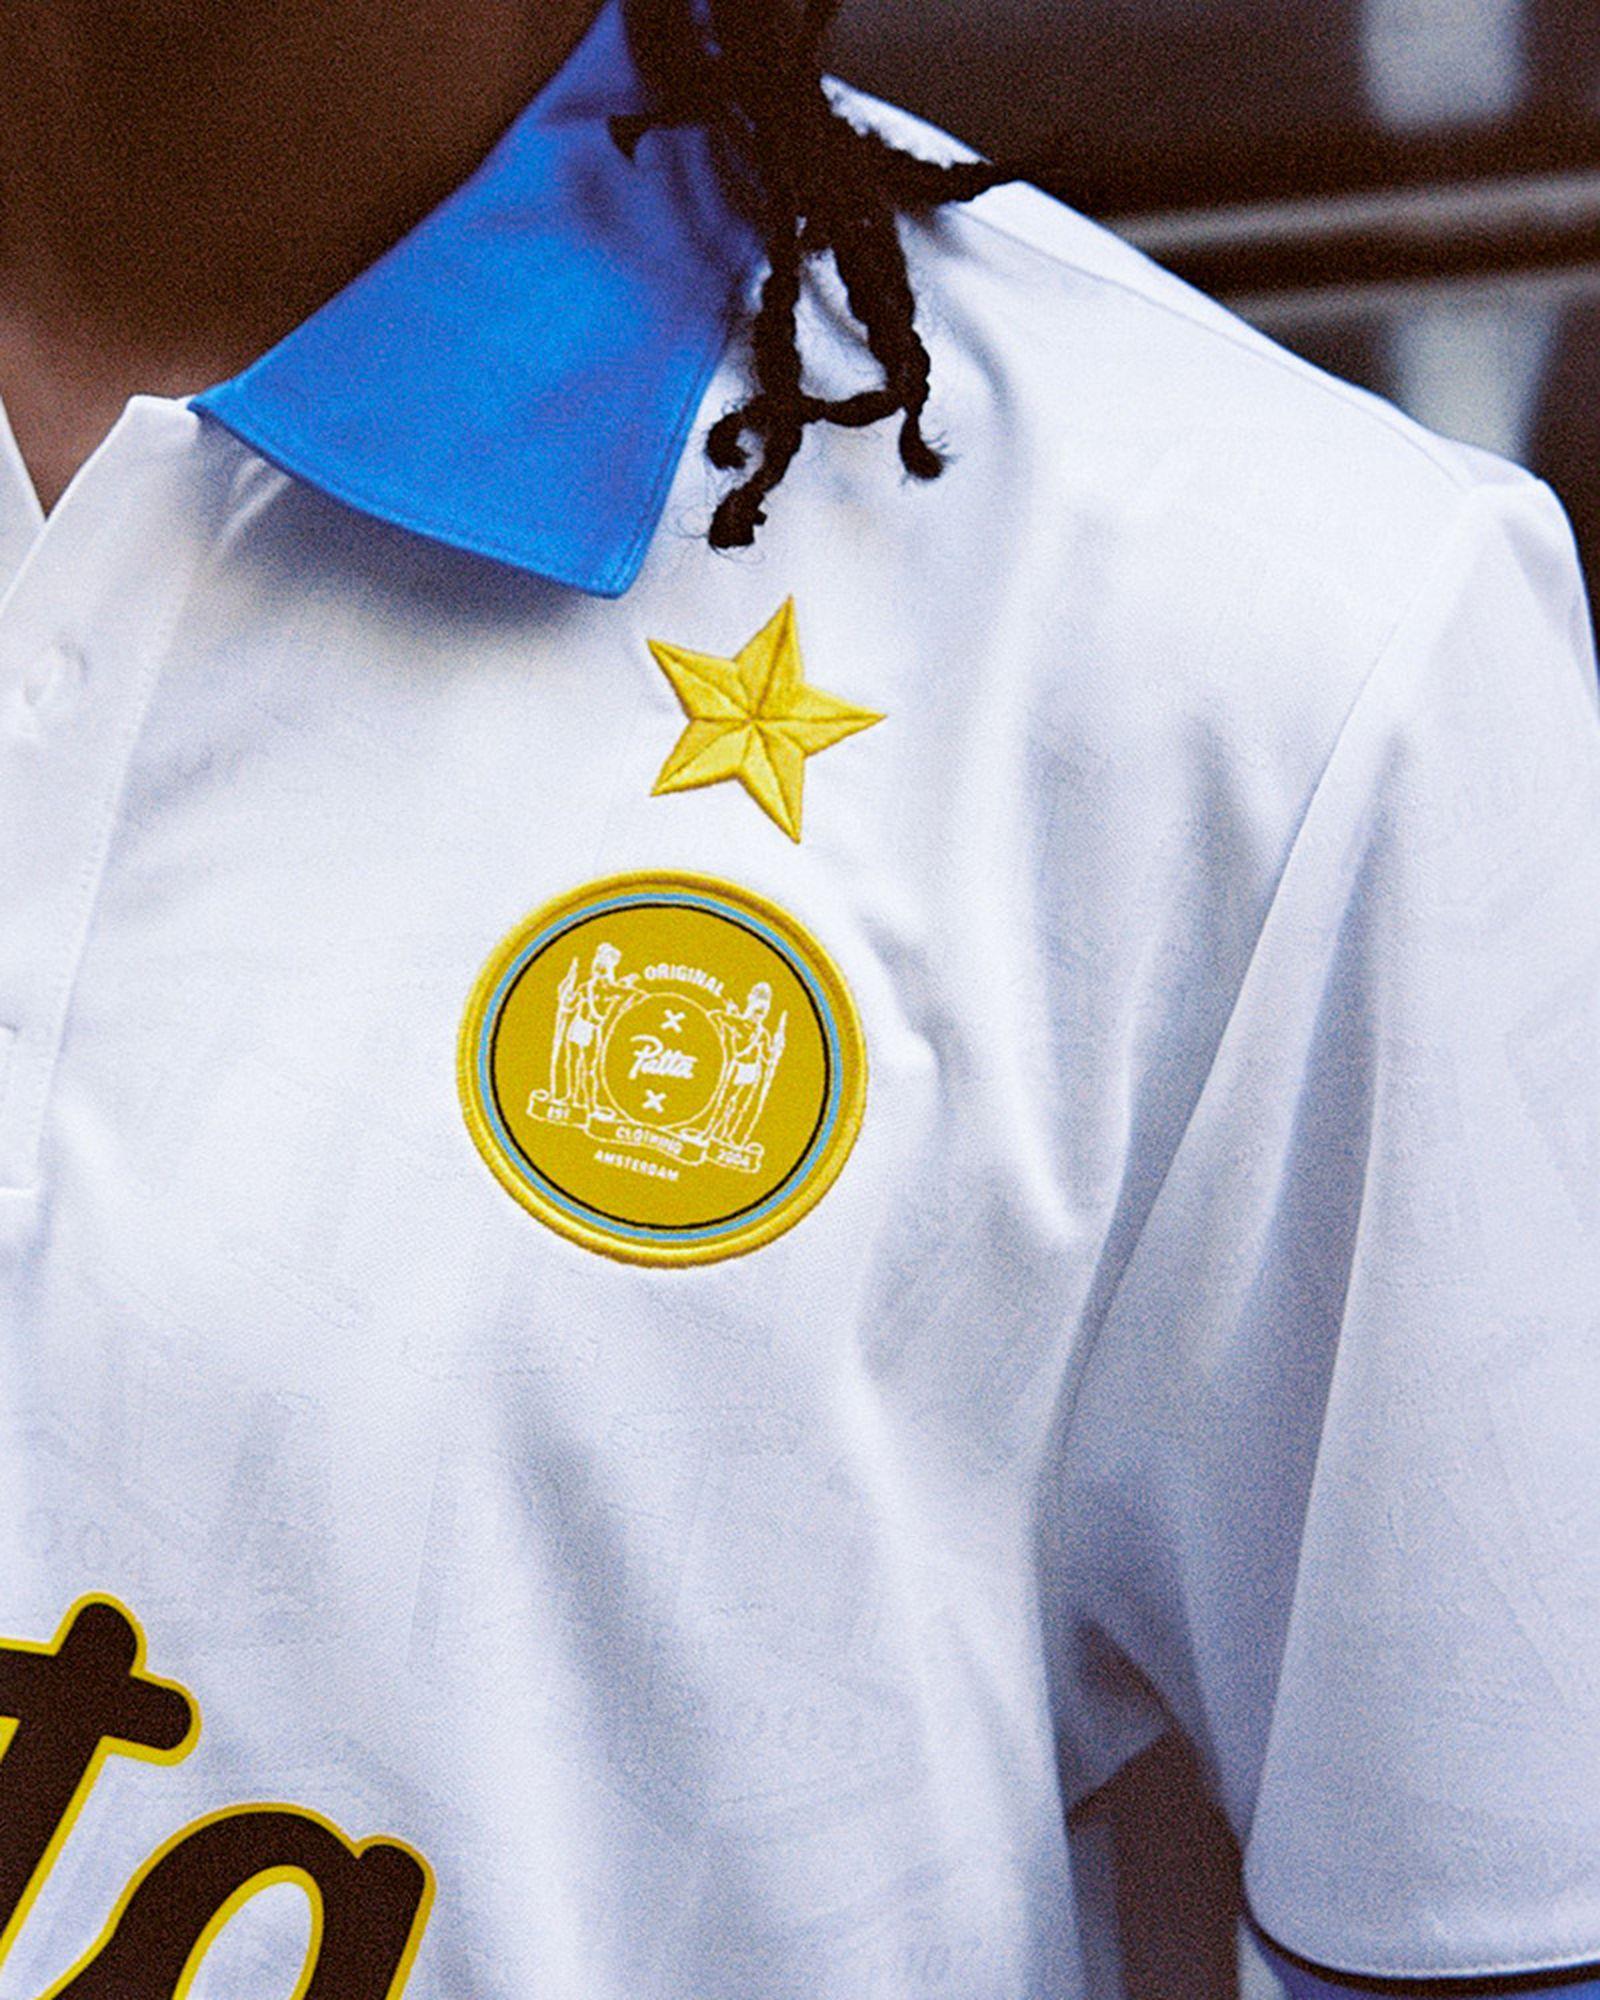 patta-umbro-inter-away-jersey-release-date-price-08